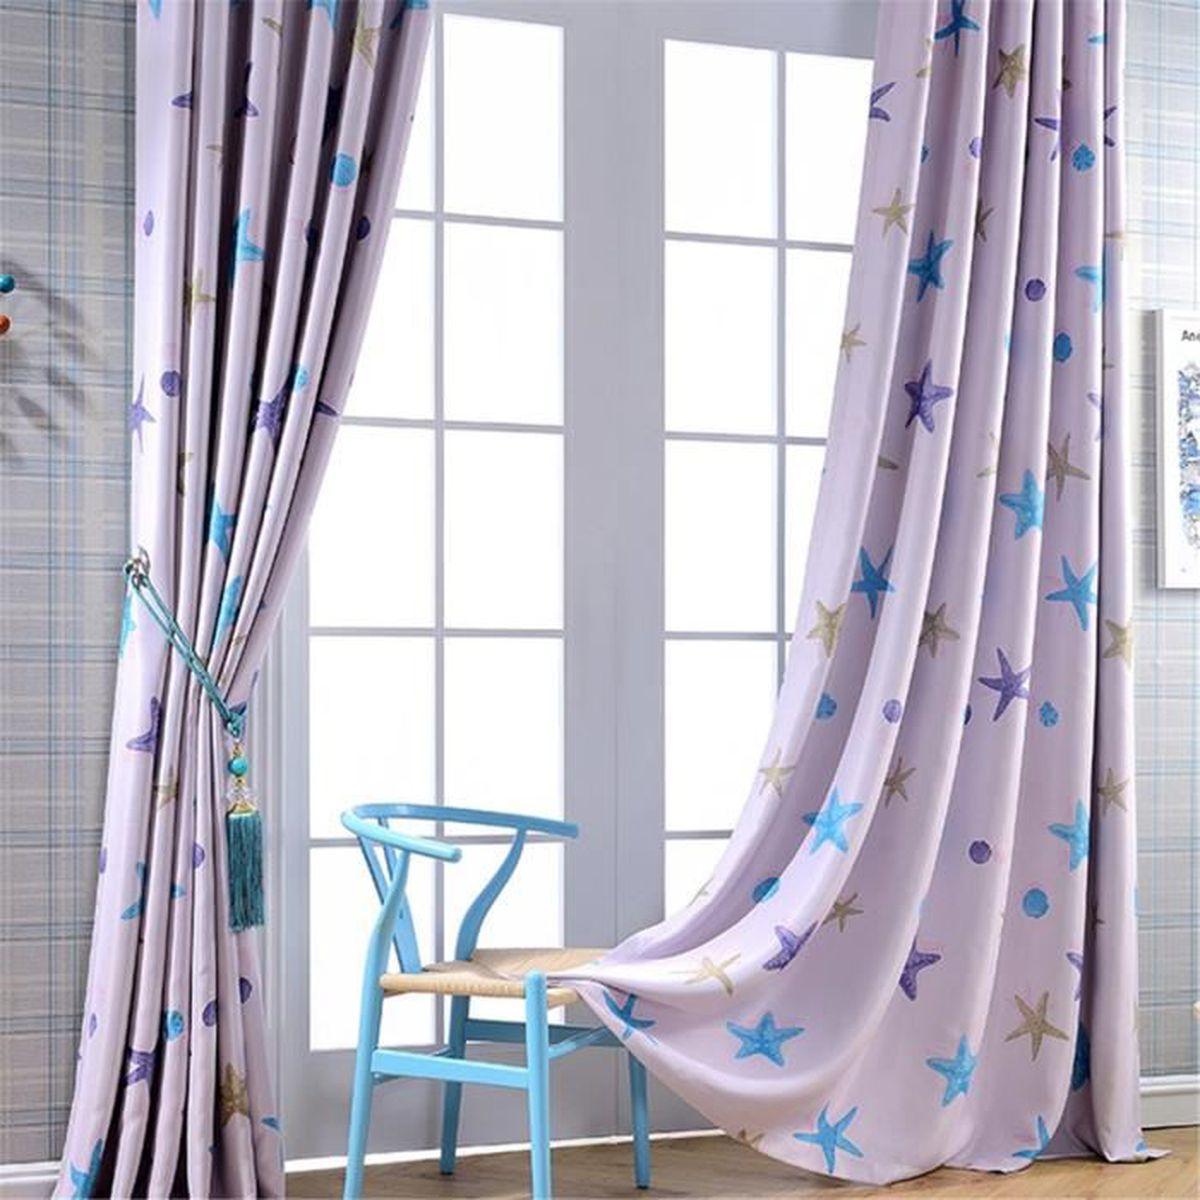 rideaux occultants toiles de mer motif rideau polyester ombre tissu enfants d coration chambre. Black Bedroom Furniture Sets. Home Design Ideas